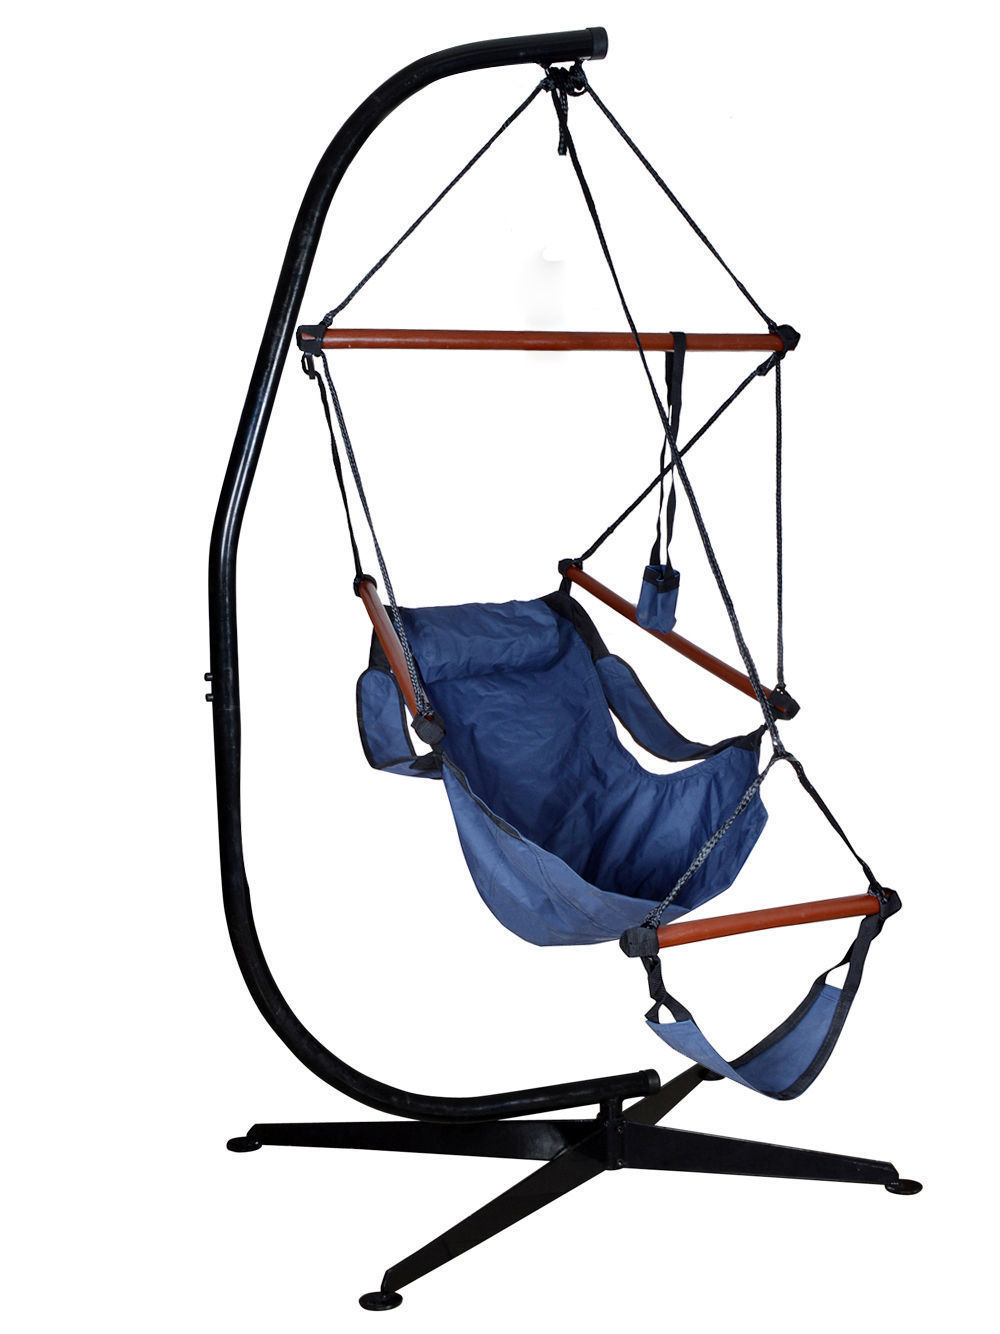 Stunning Hanging Air Chair Hammock Hammock With Best Swing Chair.